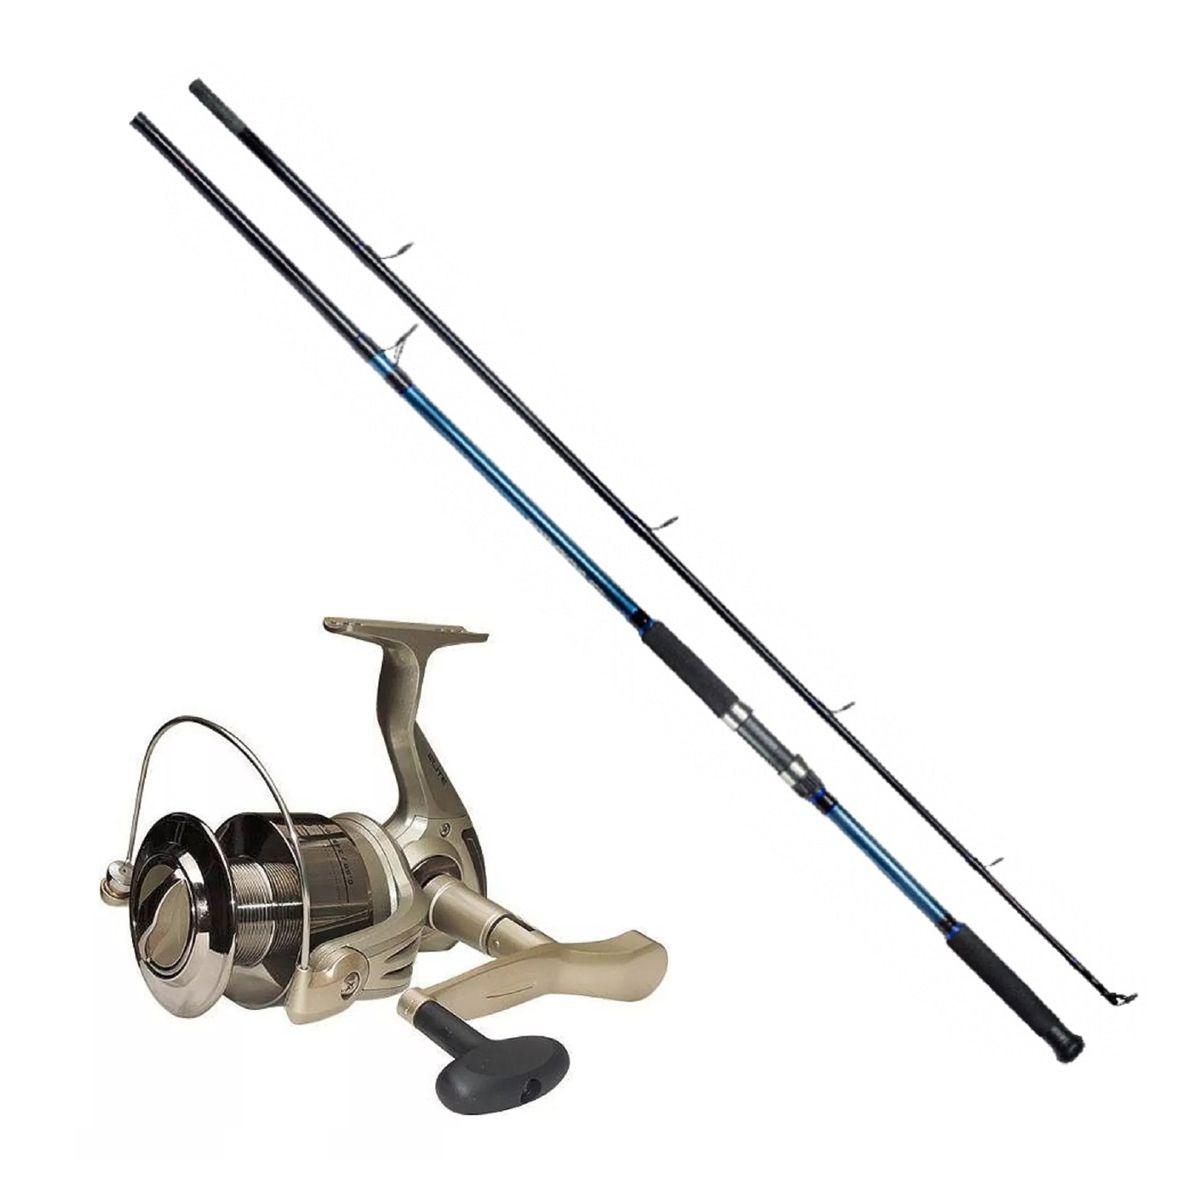 Kit Pesca Molinete Elite 2000 + Vara Solara 1,80m 20 Lbs Azul Marine Sports